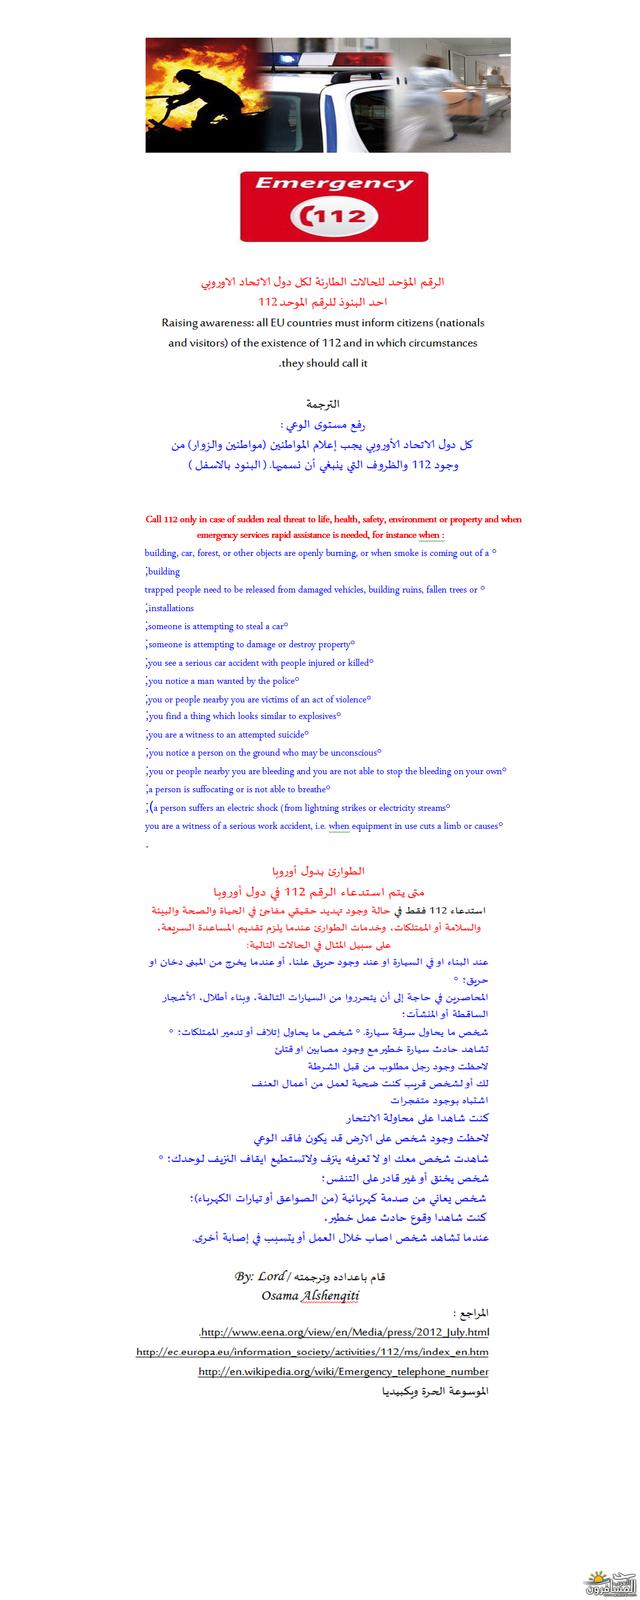 arabtrvl1433365443582.png